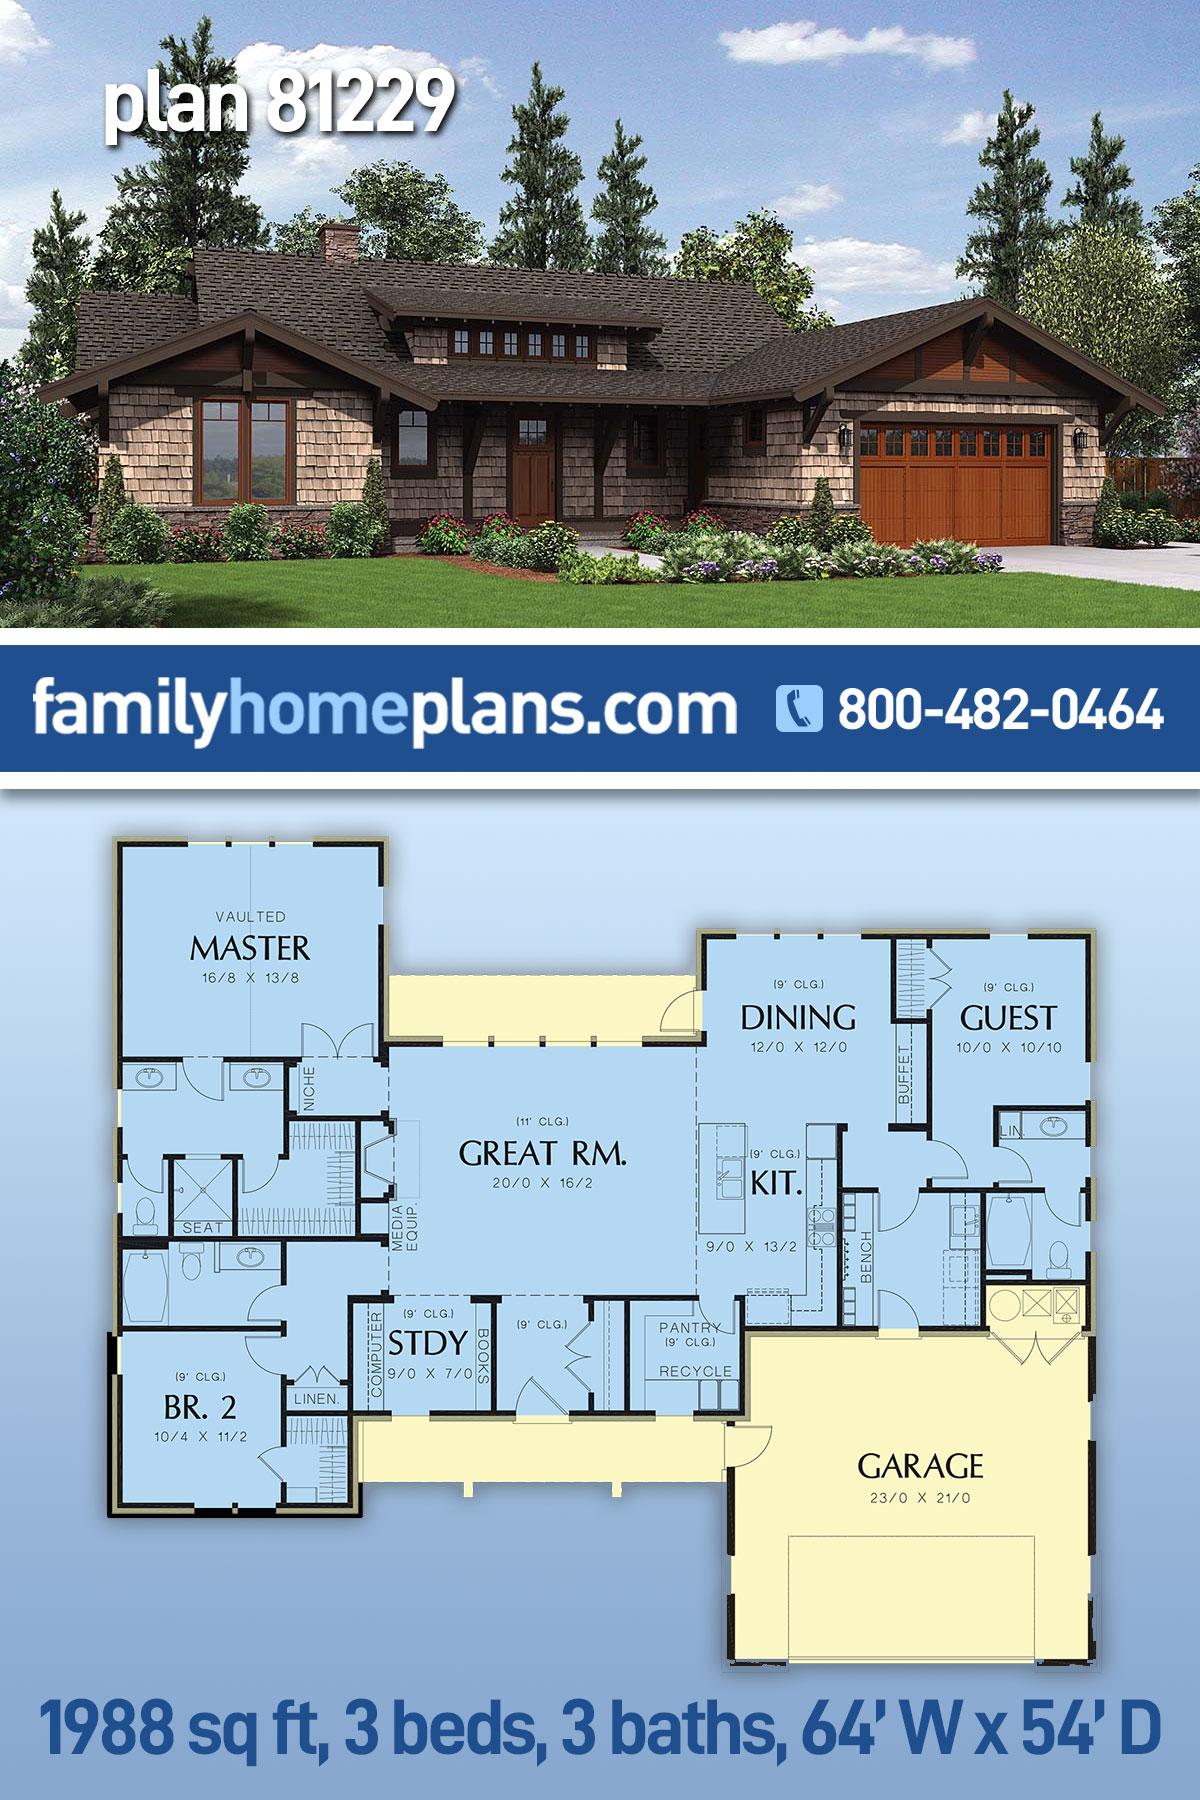 Bungalow, Craftsman House Plan 81229 with 3 Beds, 3 Baths, 2 Car Garage